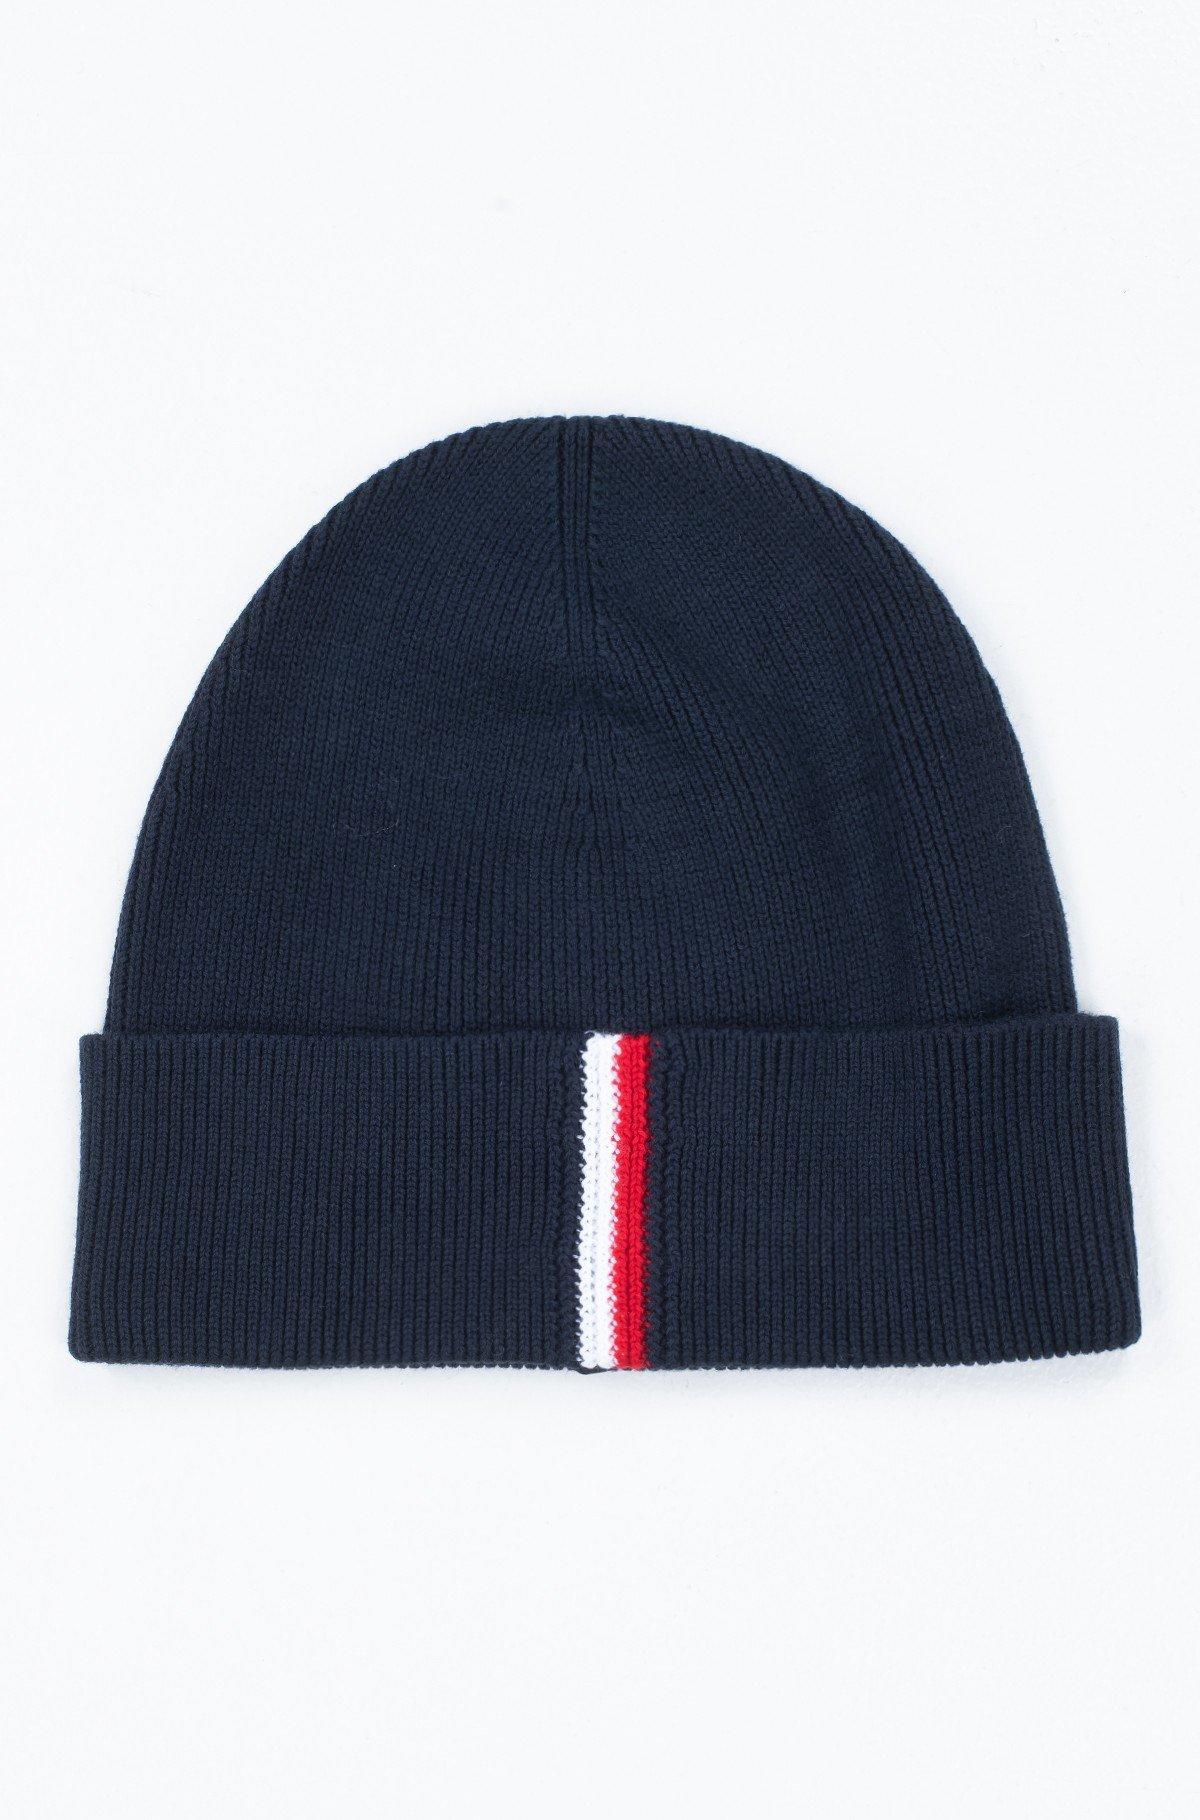 Kepurė TH RIB BEANIE-full-1